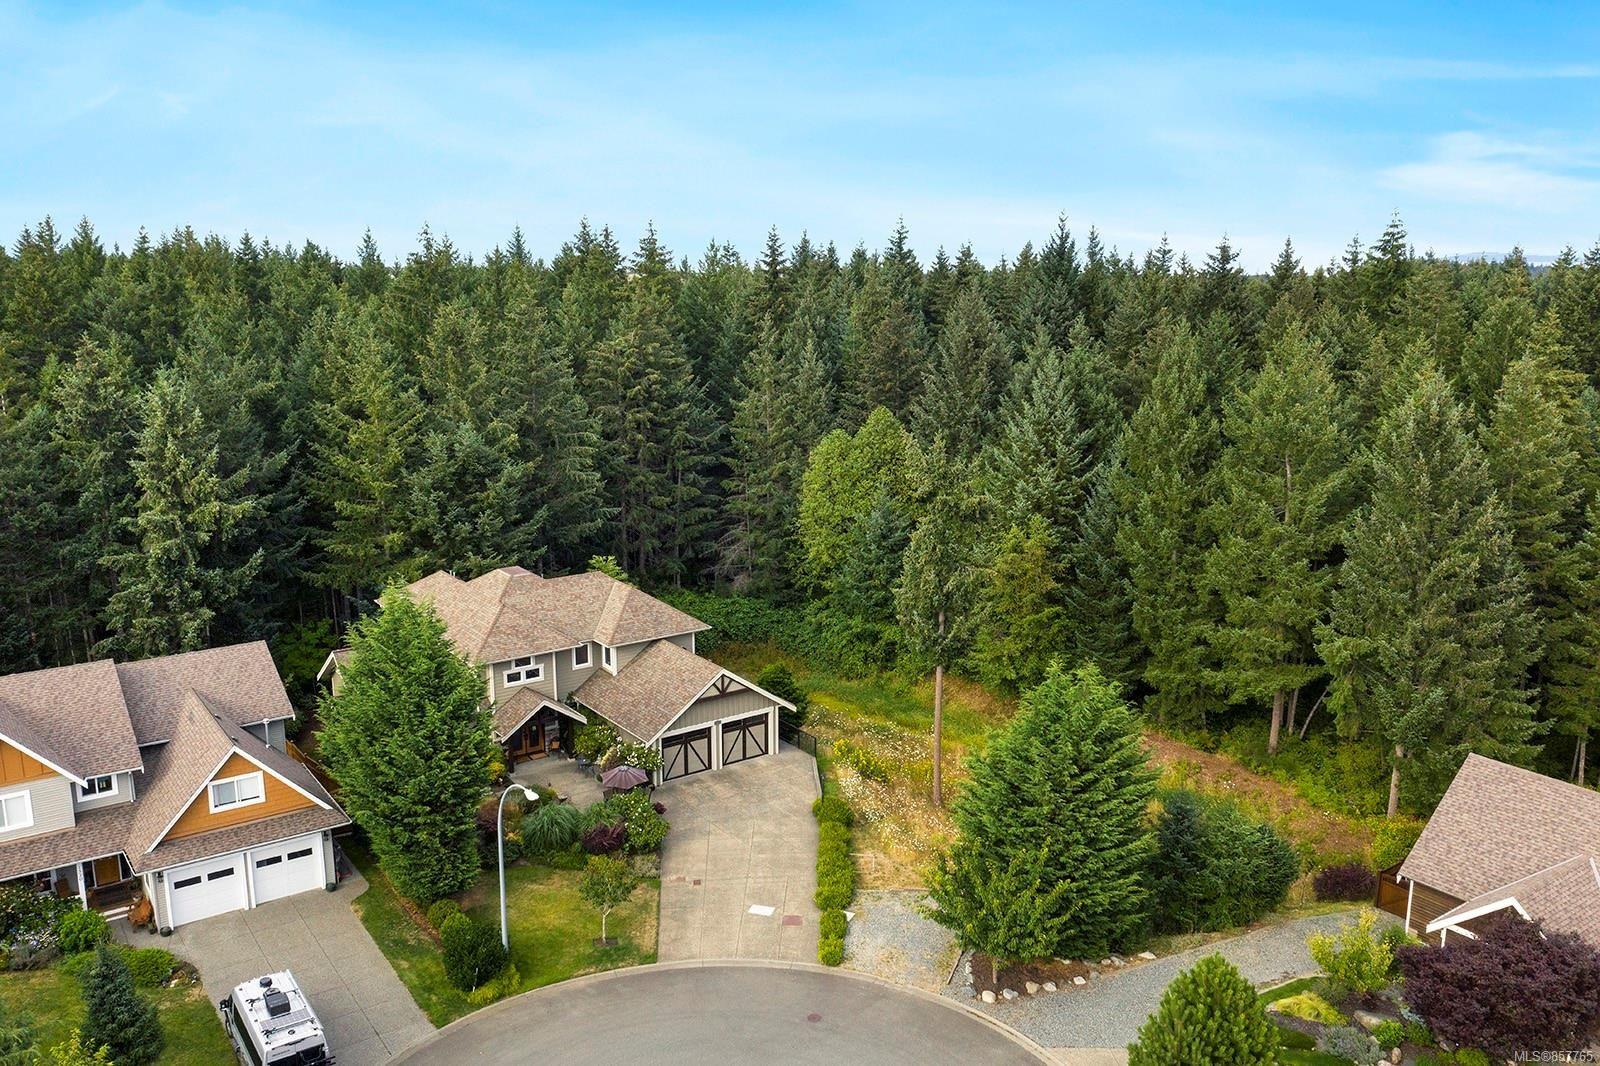 Photo 2: Photos: 1516 Highridge Dr in : CV Comox (Town of) House for sale (Comox Valley)  : MLS®# 857765